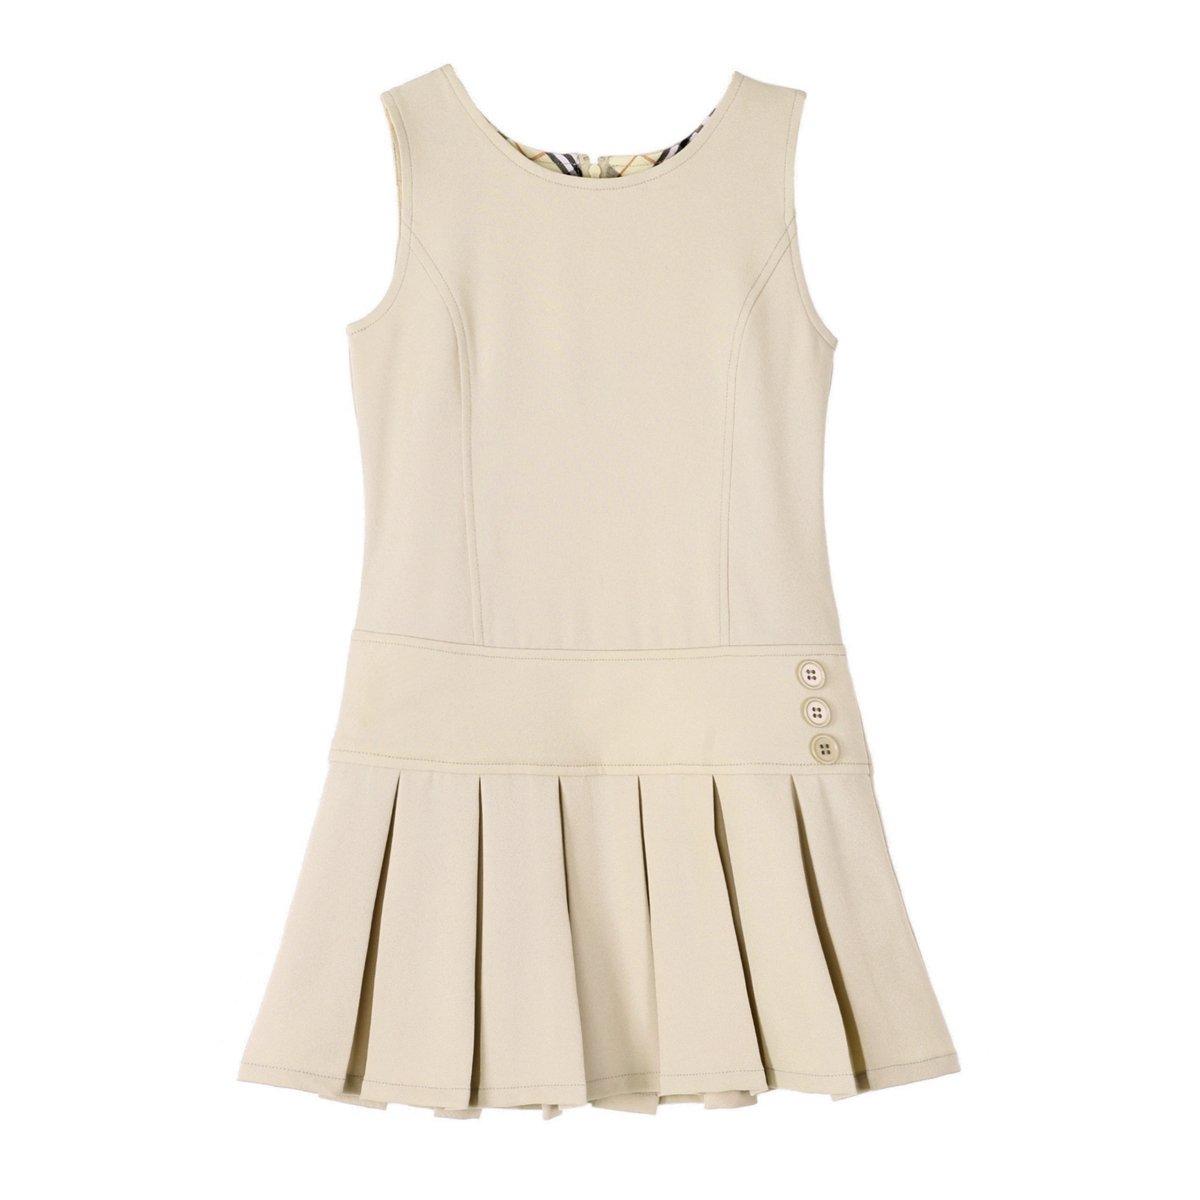 Bienzoe Girl's Stretchy Pleated Hem School Uniforms Jumper Khaki 7